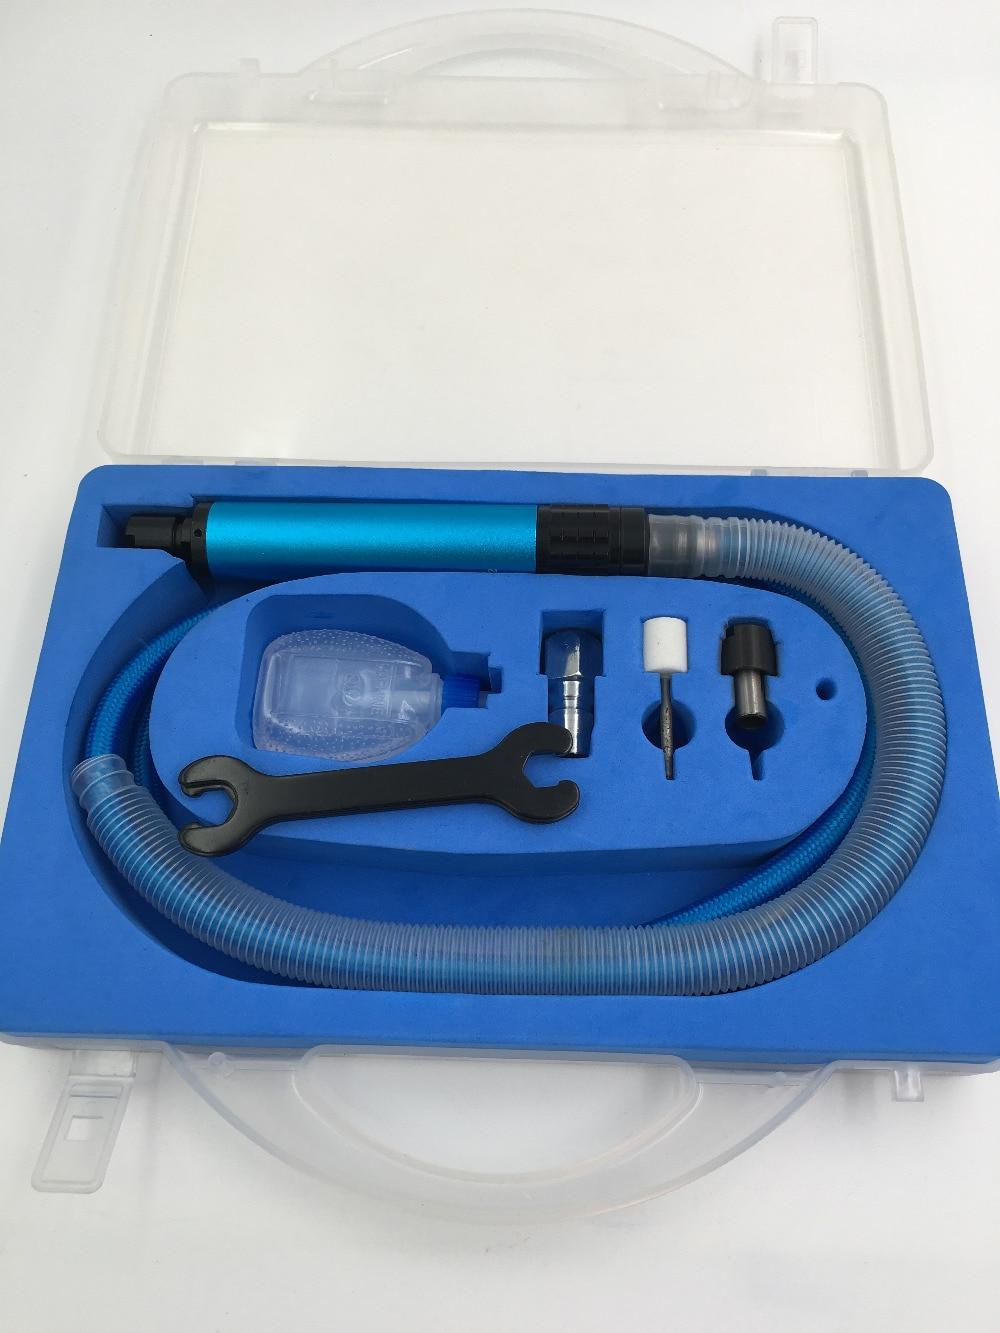 SAT7475 FM-206 Air Inlet 1/4 Pneumatic Mini Frinders Series Air Tool Mini Grinder Air tools su63 100 s airtac air cylinder pneumatic component air tools su series